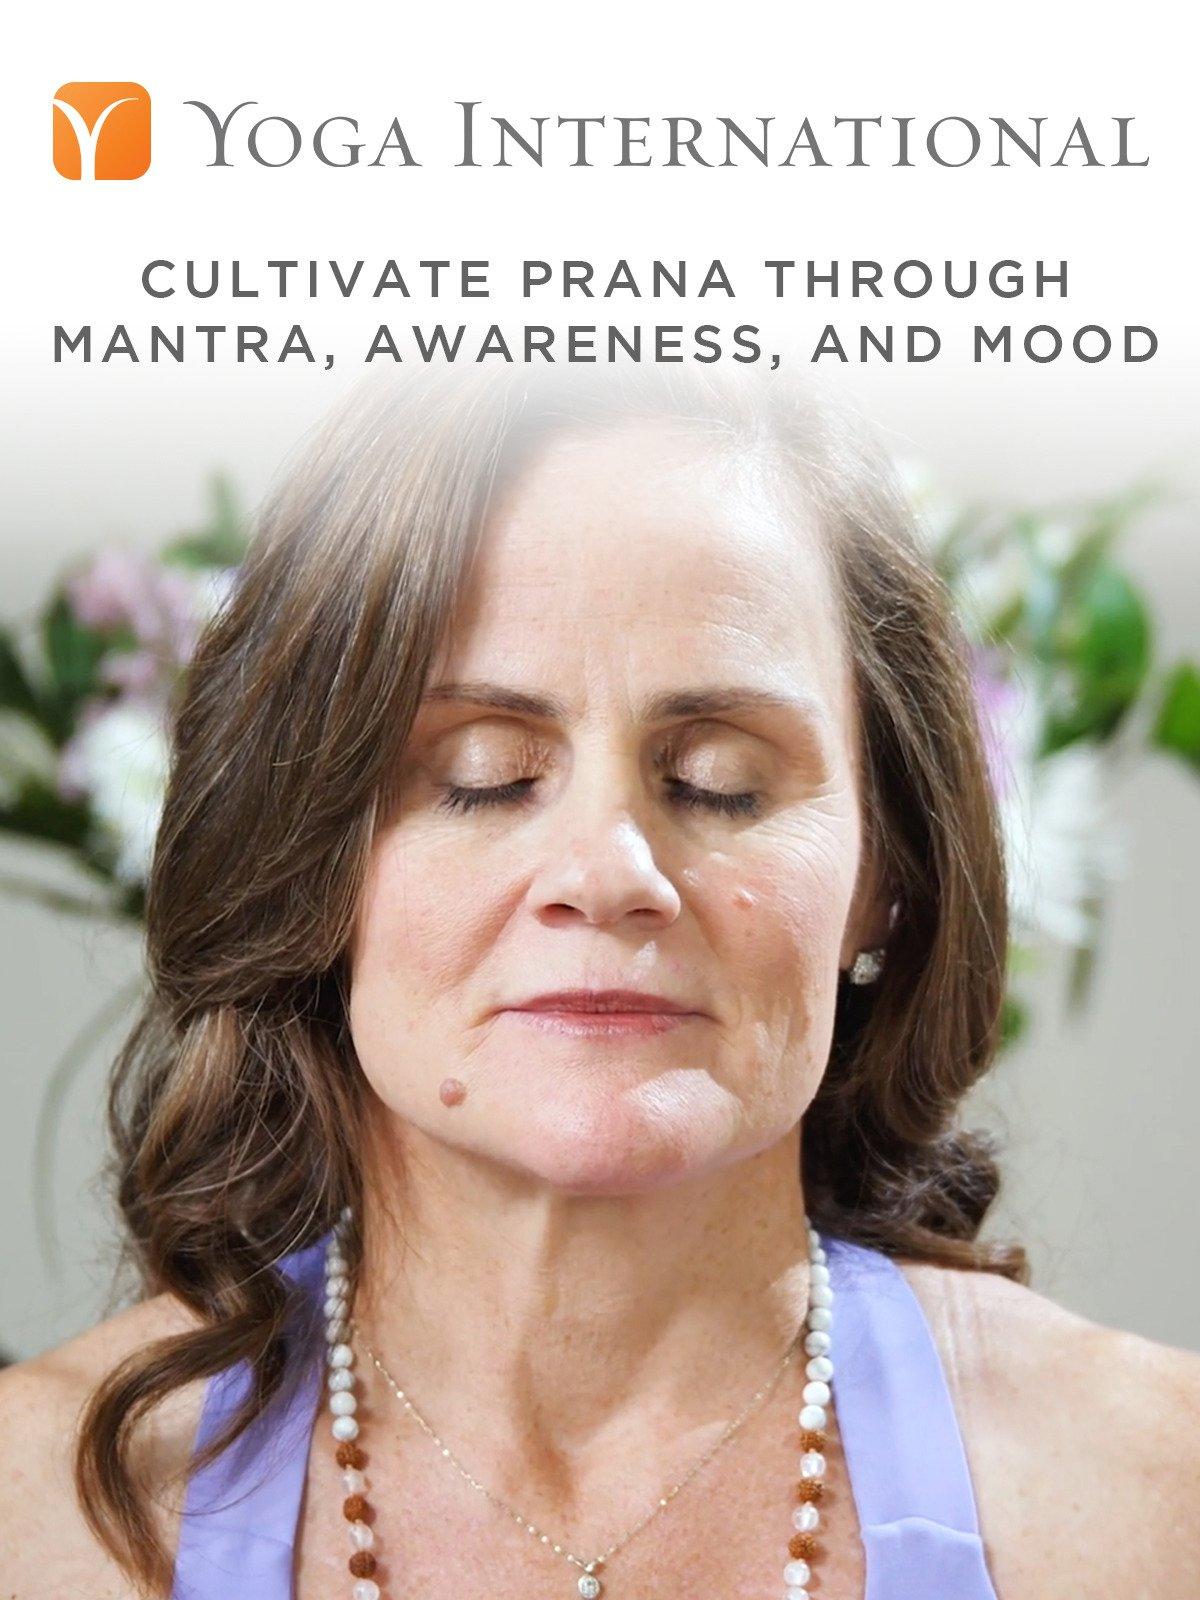 Cultivate Prana Through Mantra, Awareness, and Mood